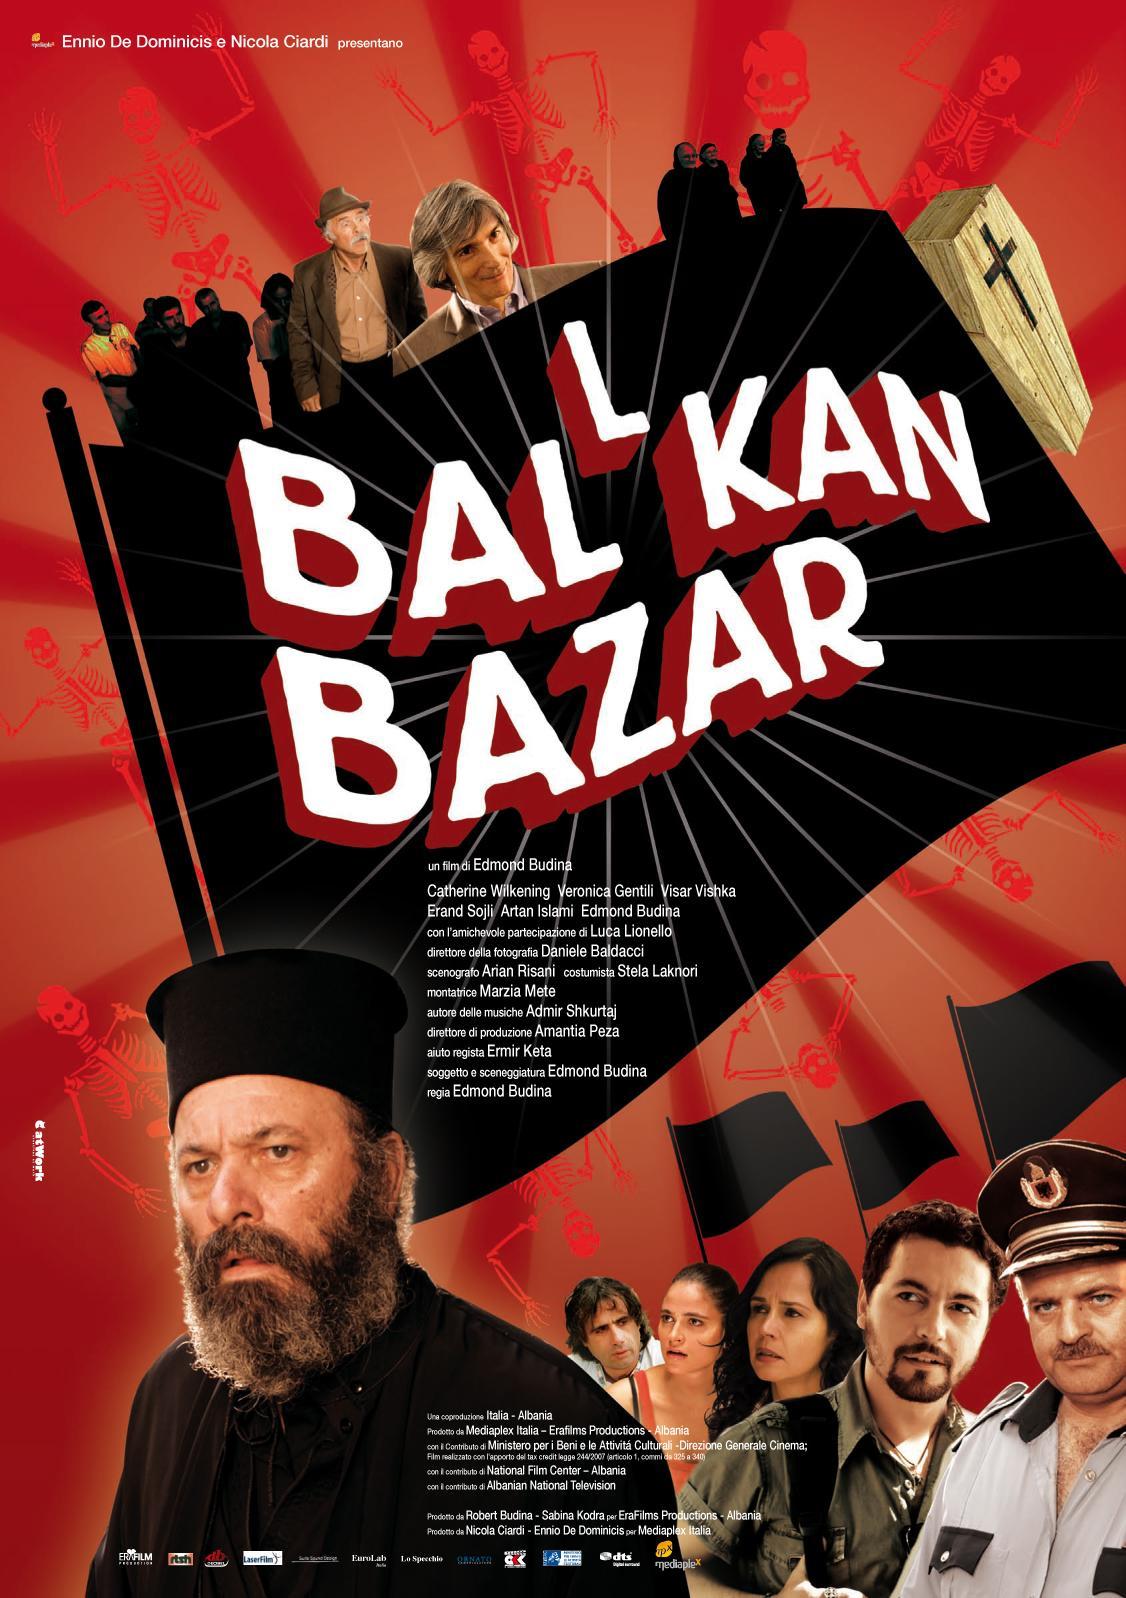 Balkan Bazar